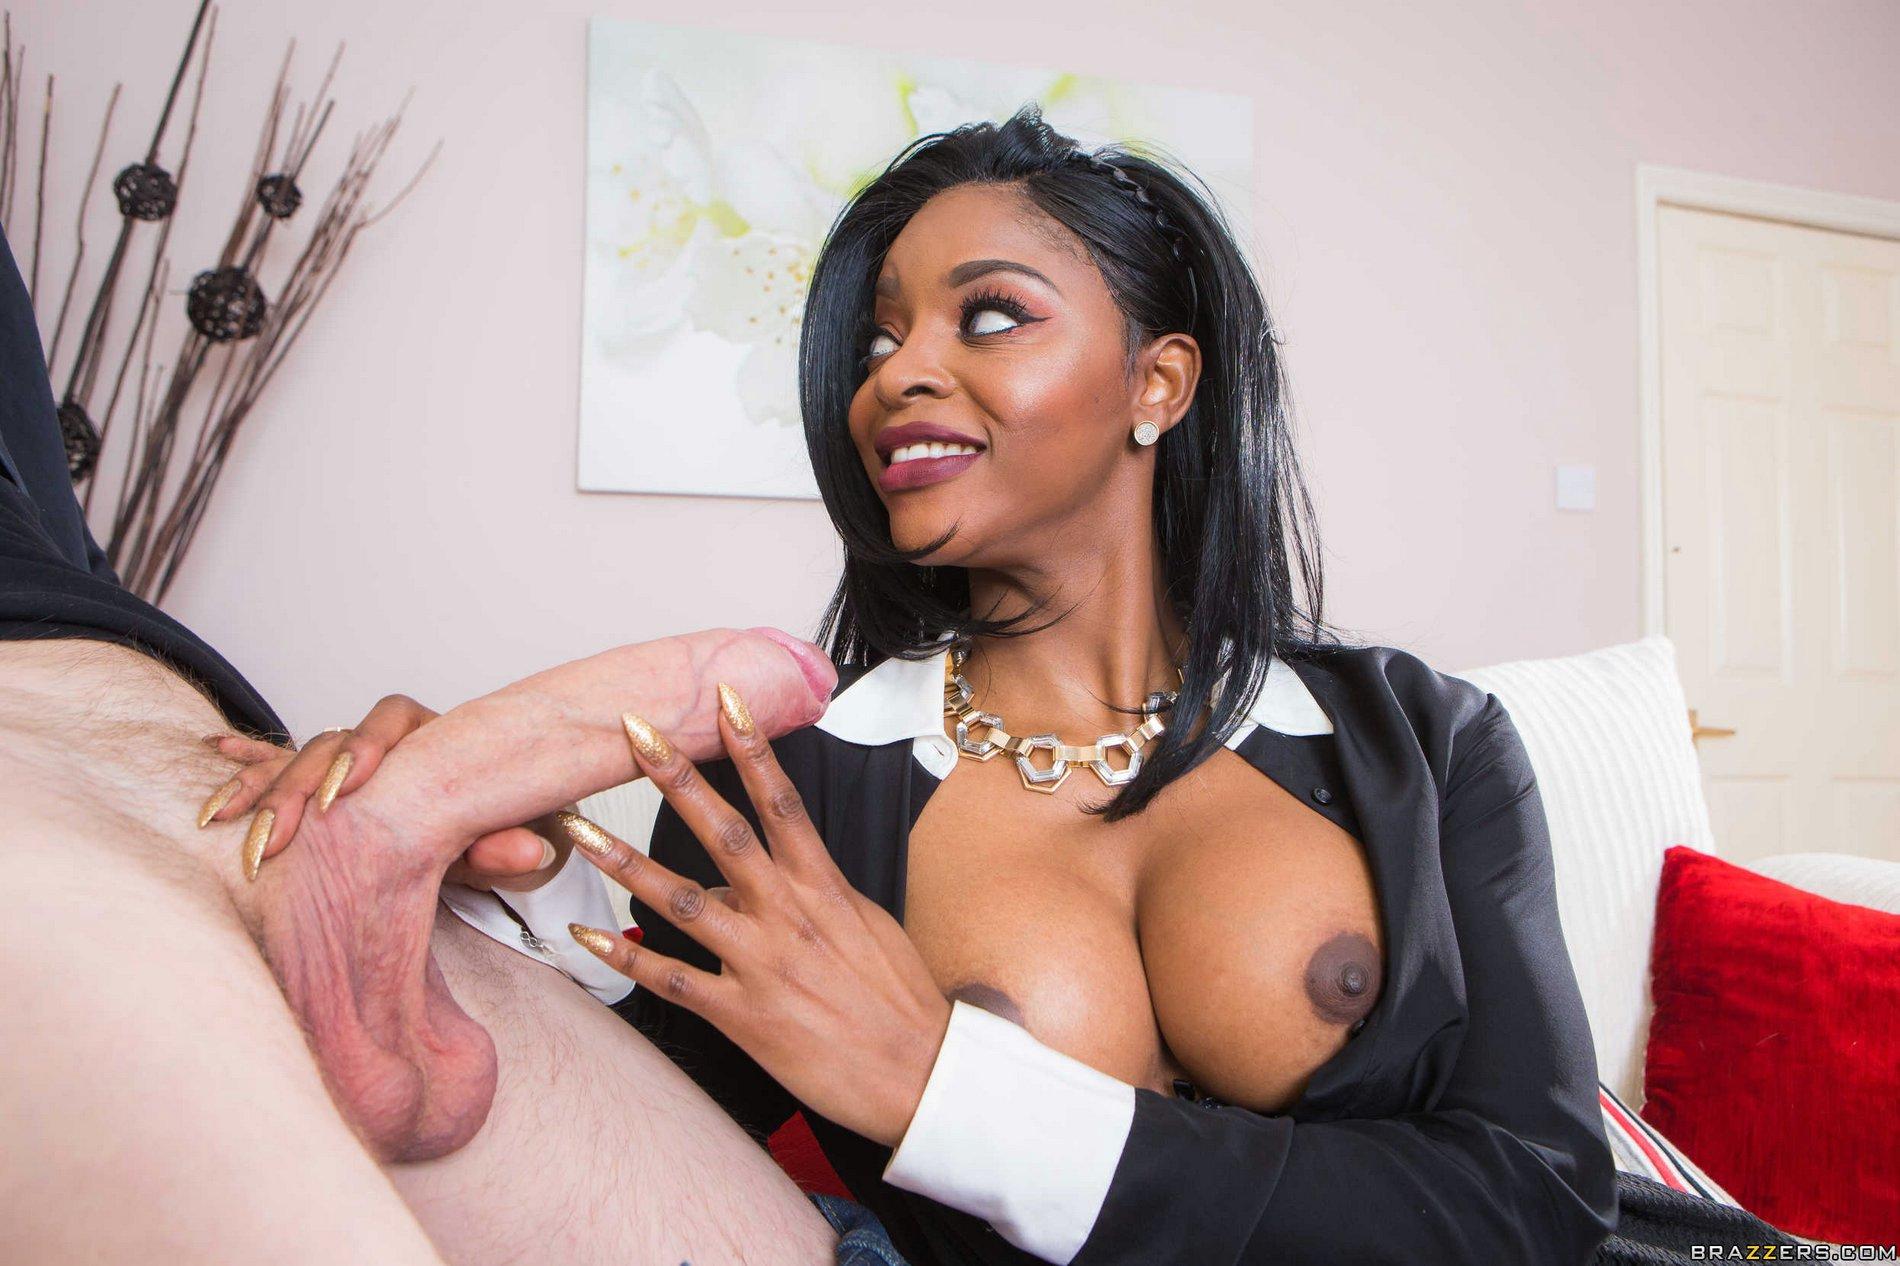 Masturbating for audience